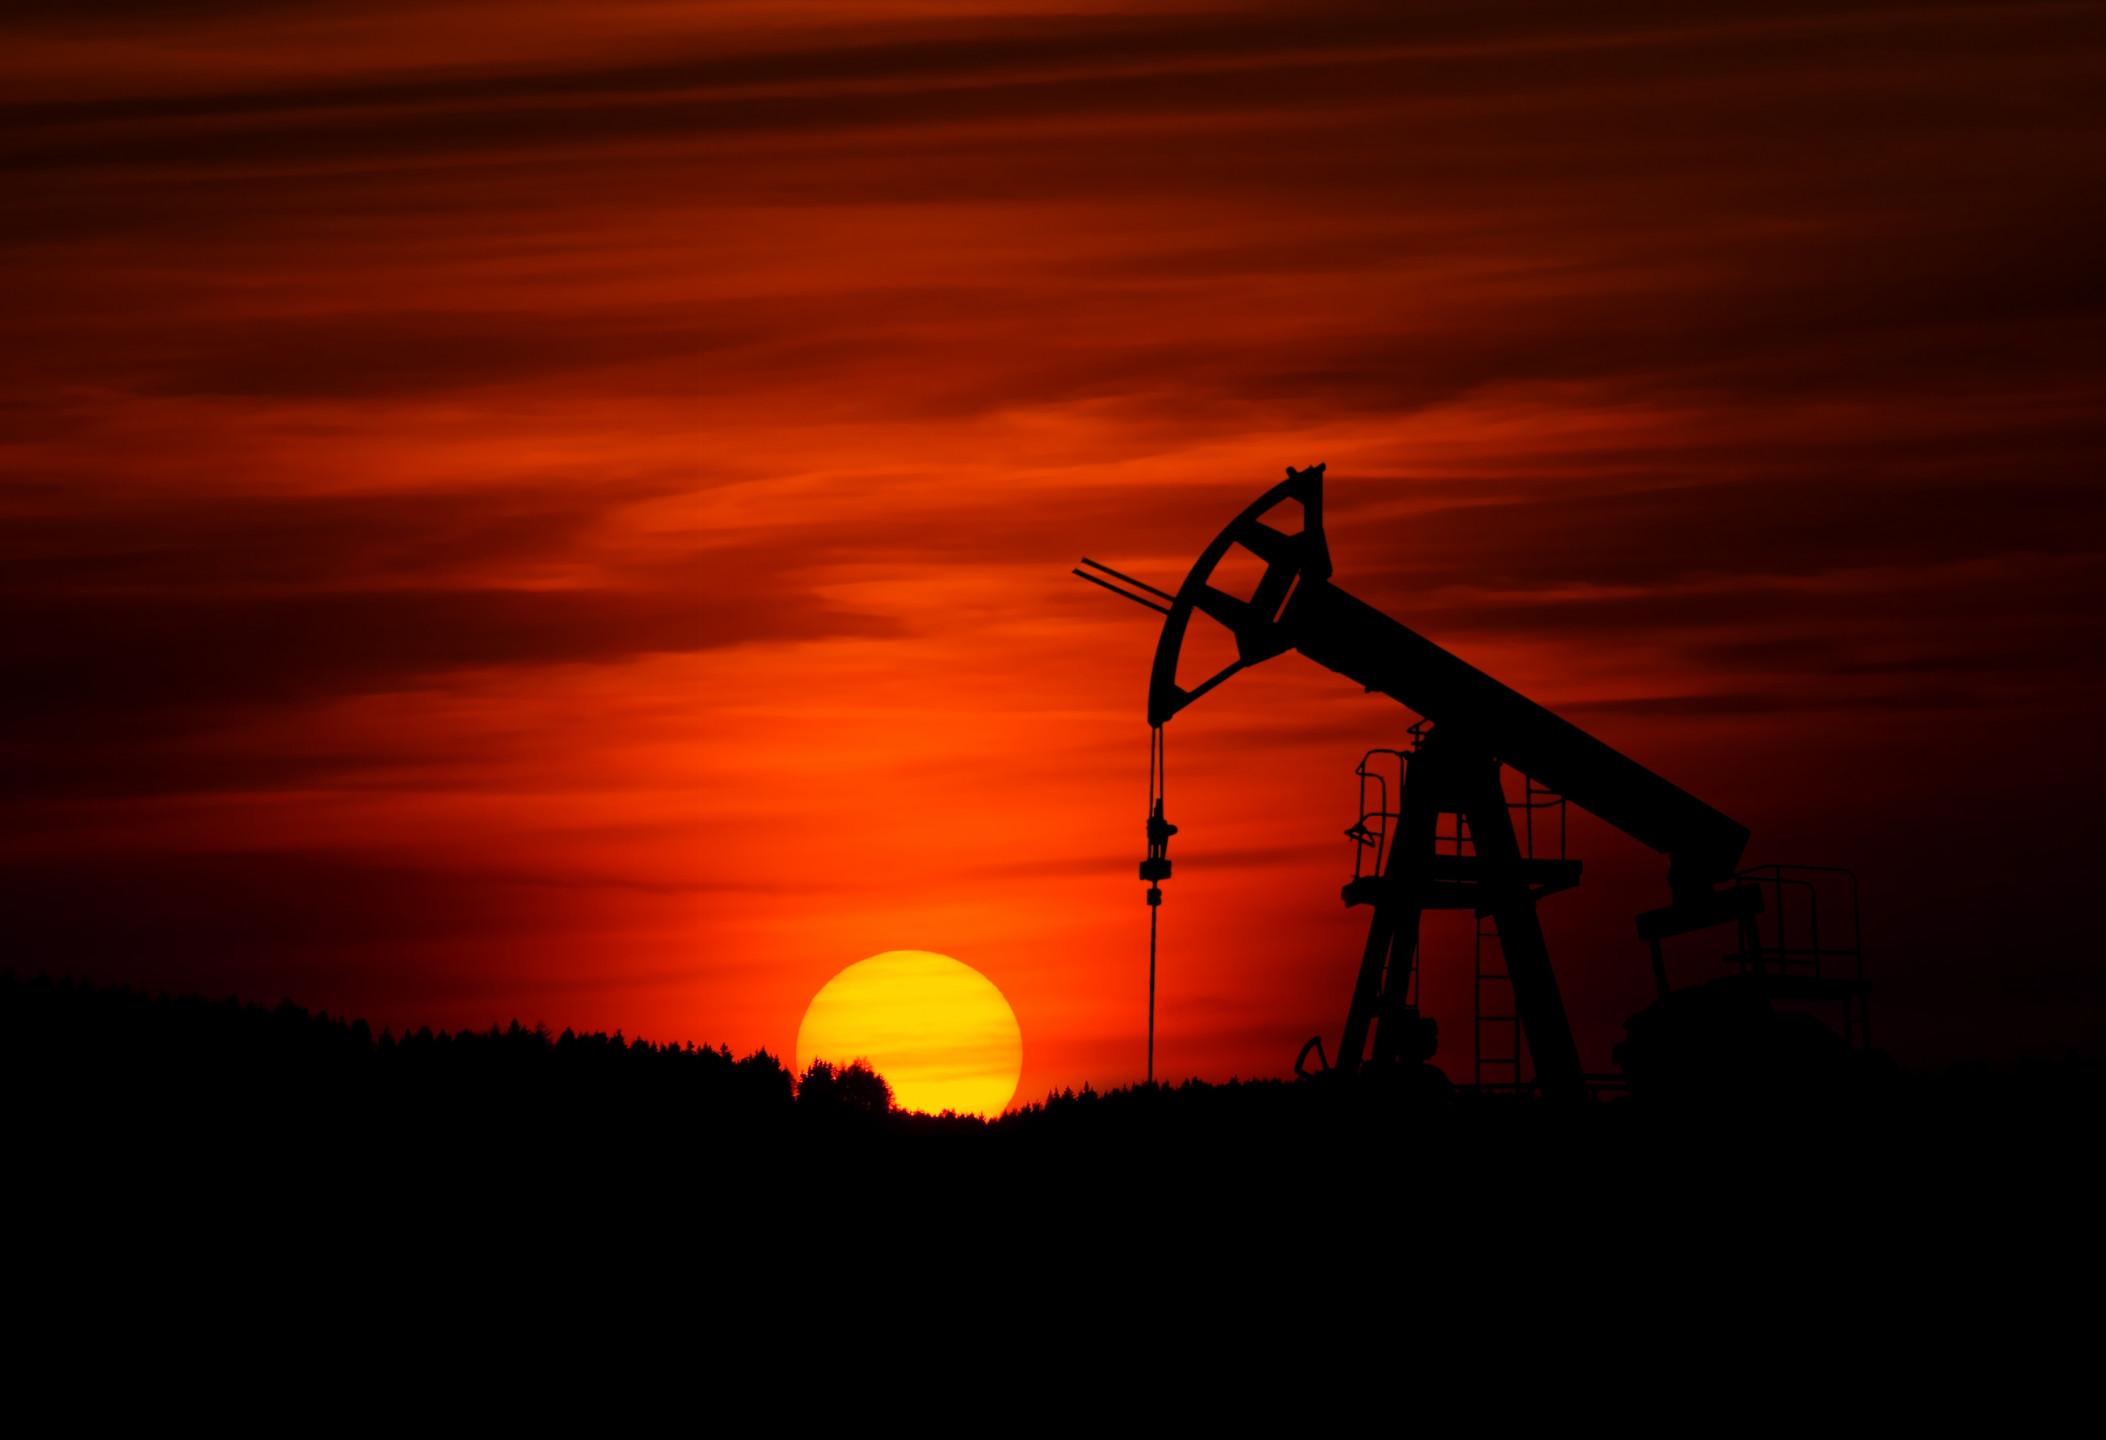 Crude oil price analysis - XBRUSD declines sharply to $56